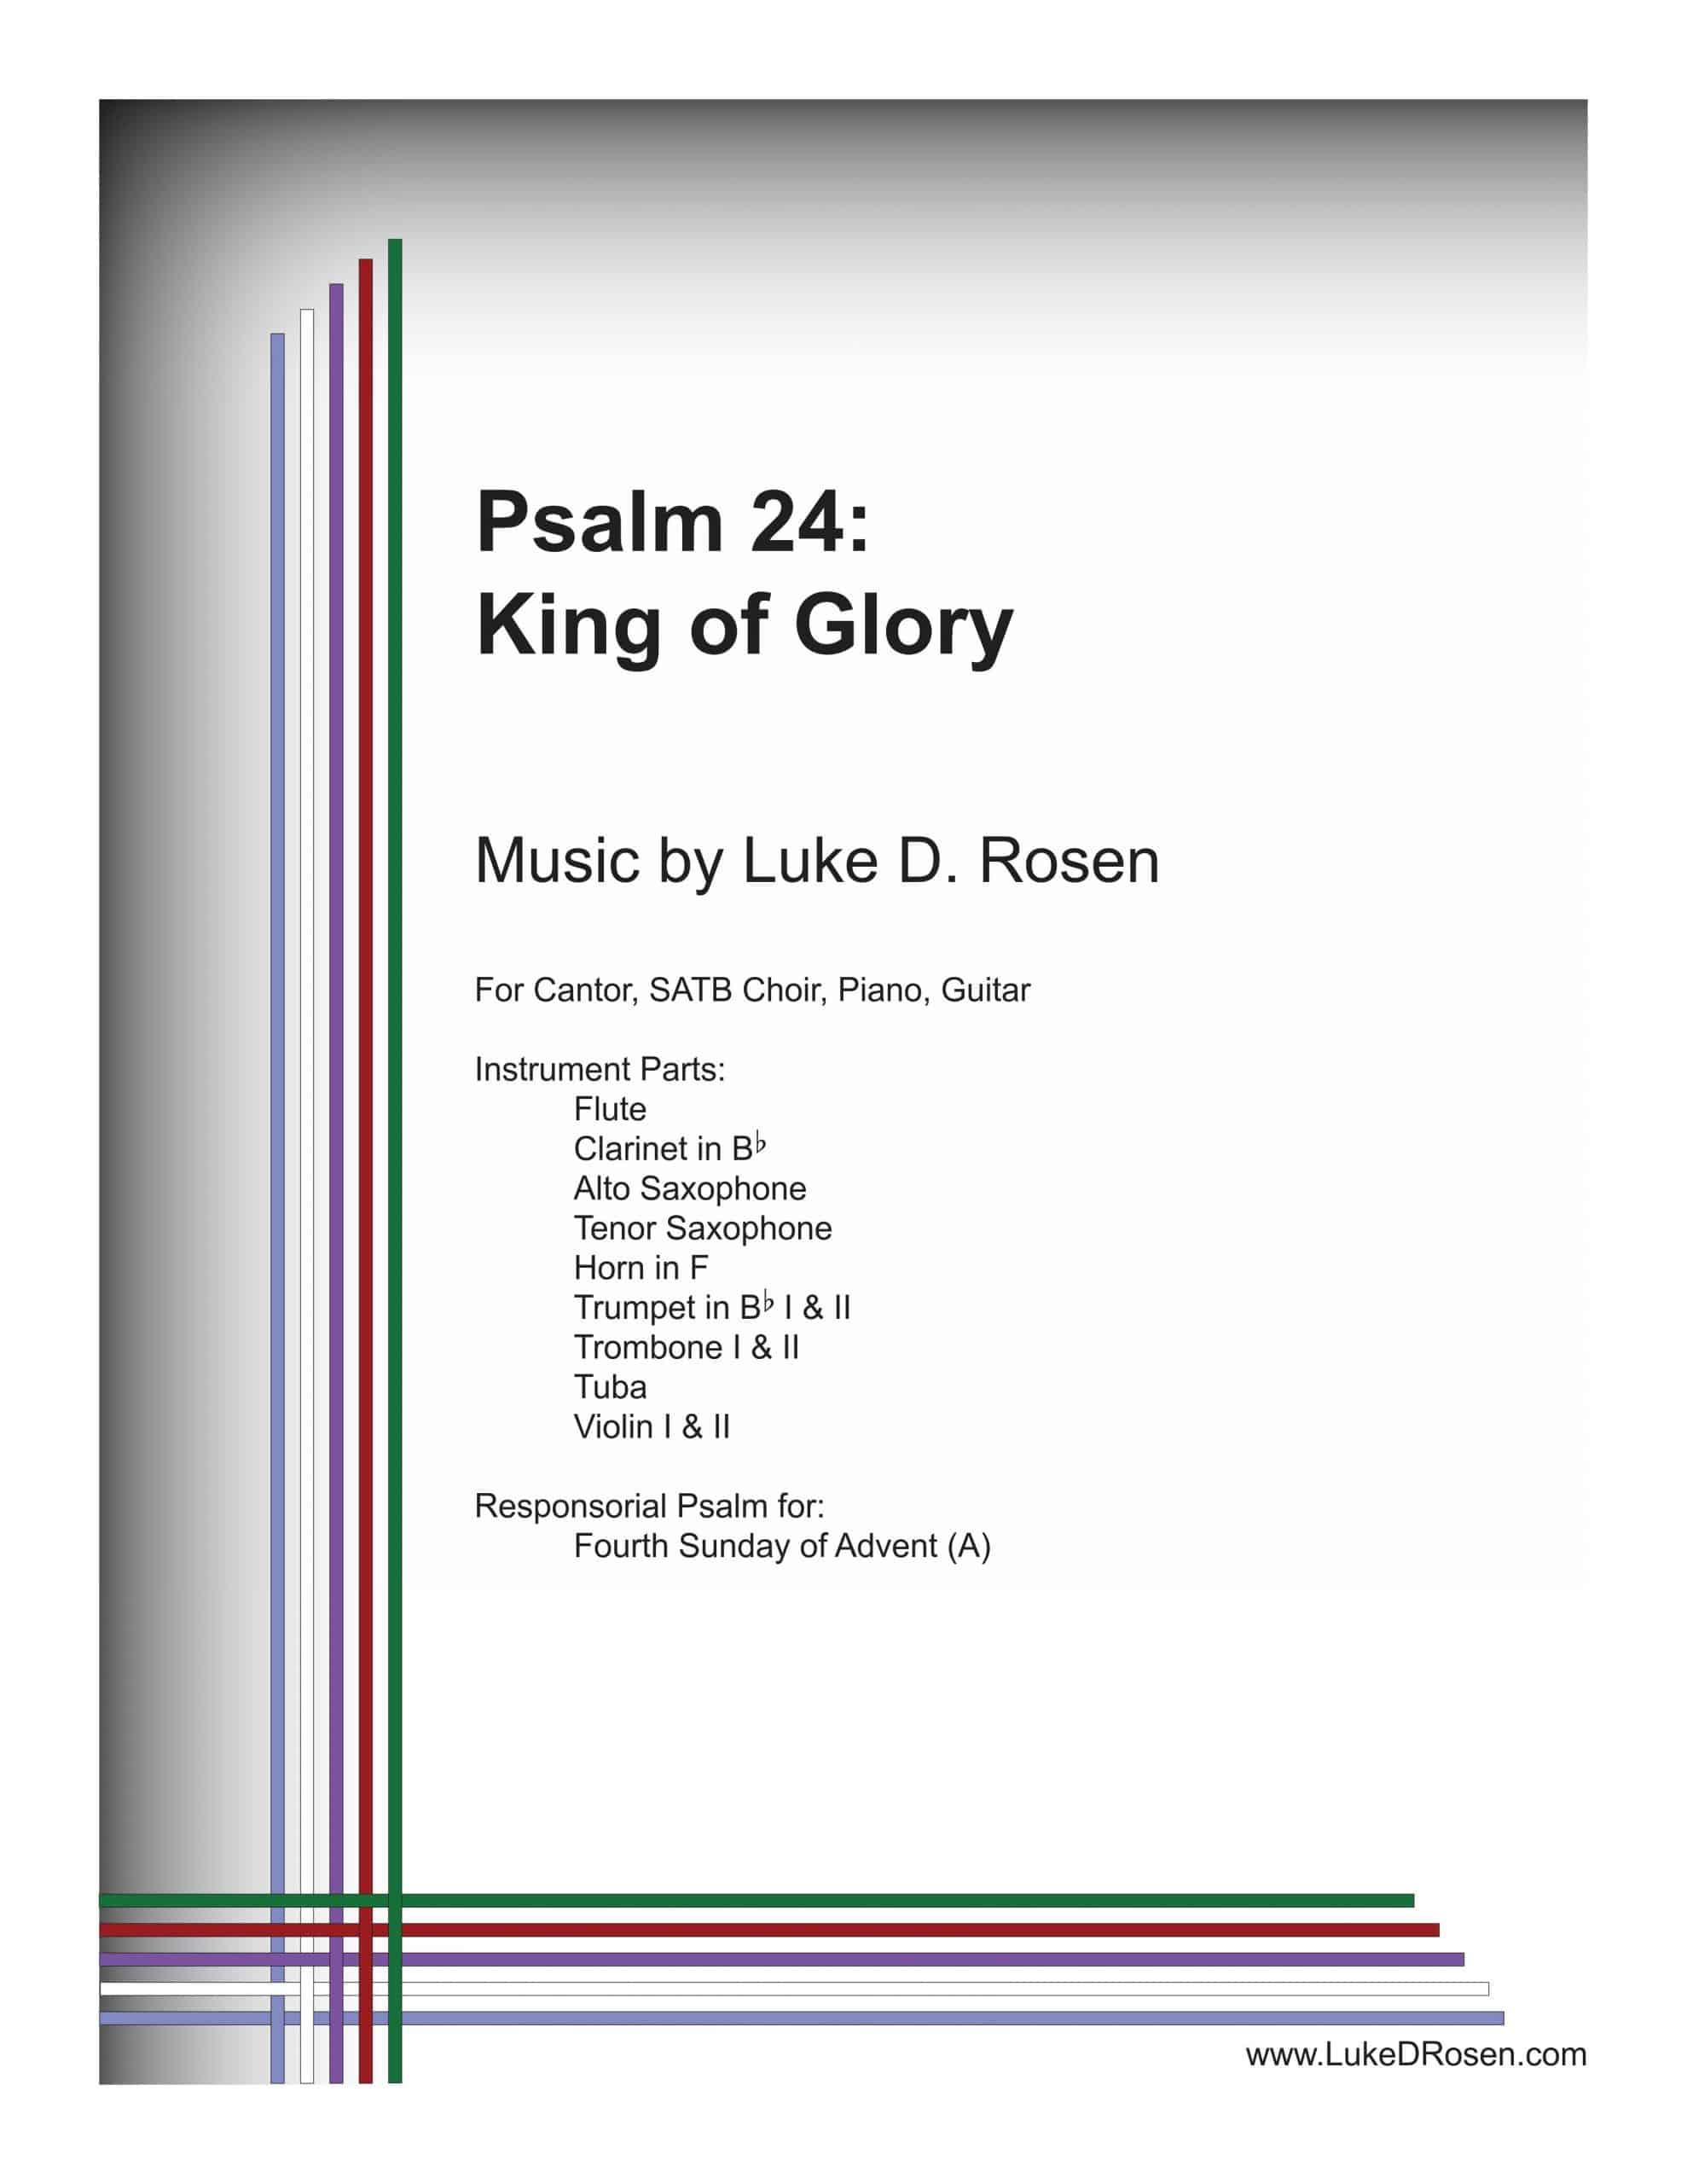 Psalm 24 King of Glory ROSEN scaled